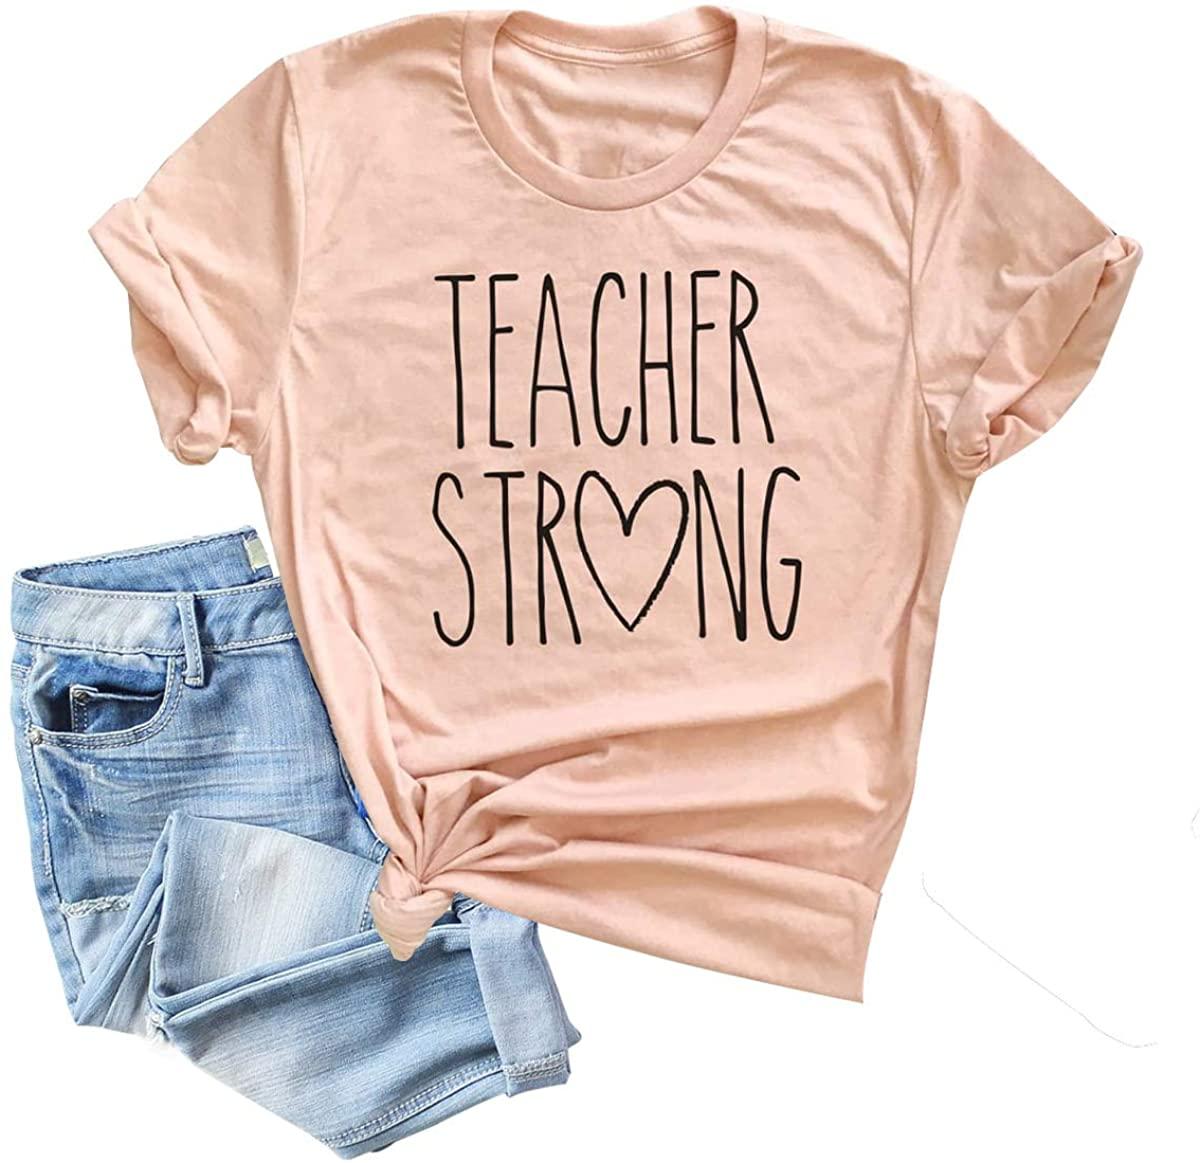 Teachers Day T Shirt Women Strong Letter Print Love Heart Graphic Tees Short Sleeve Tops